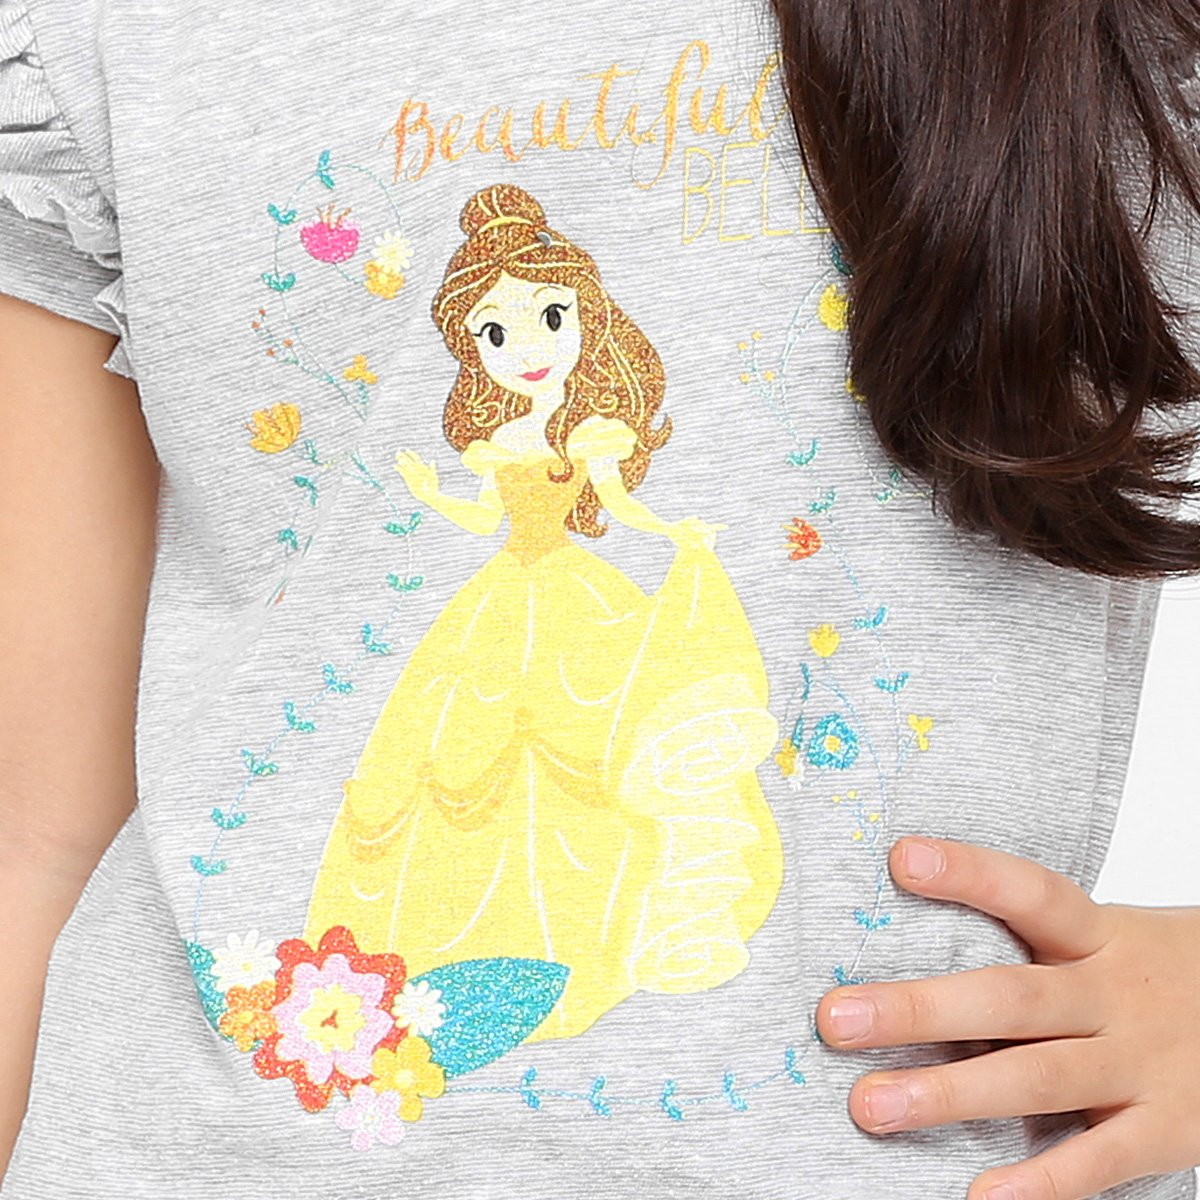 Disney Disney Bela Infantil Bela Mescla Infantil Camiseta Mescla Camiseta XS1qwUAx